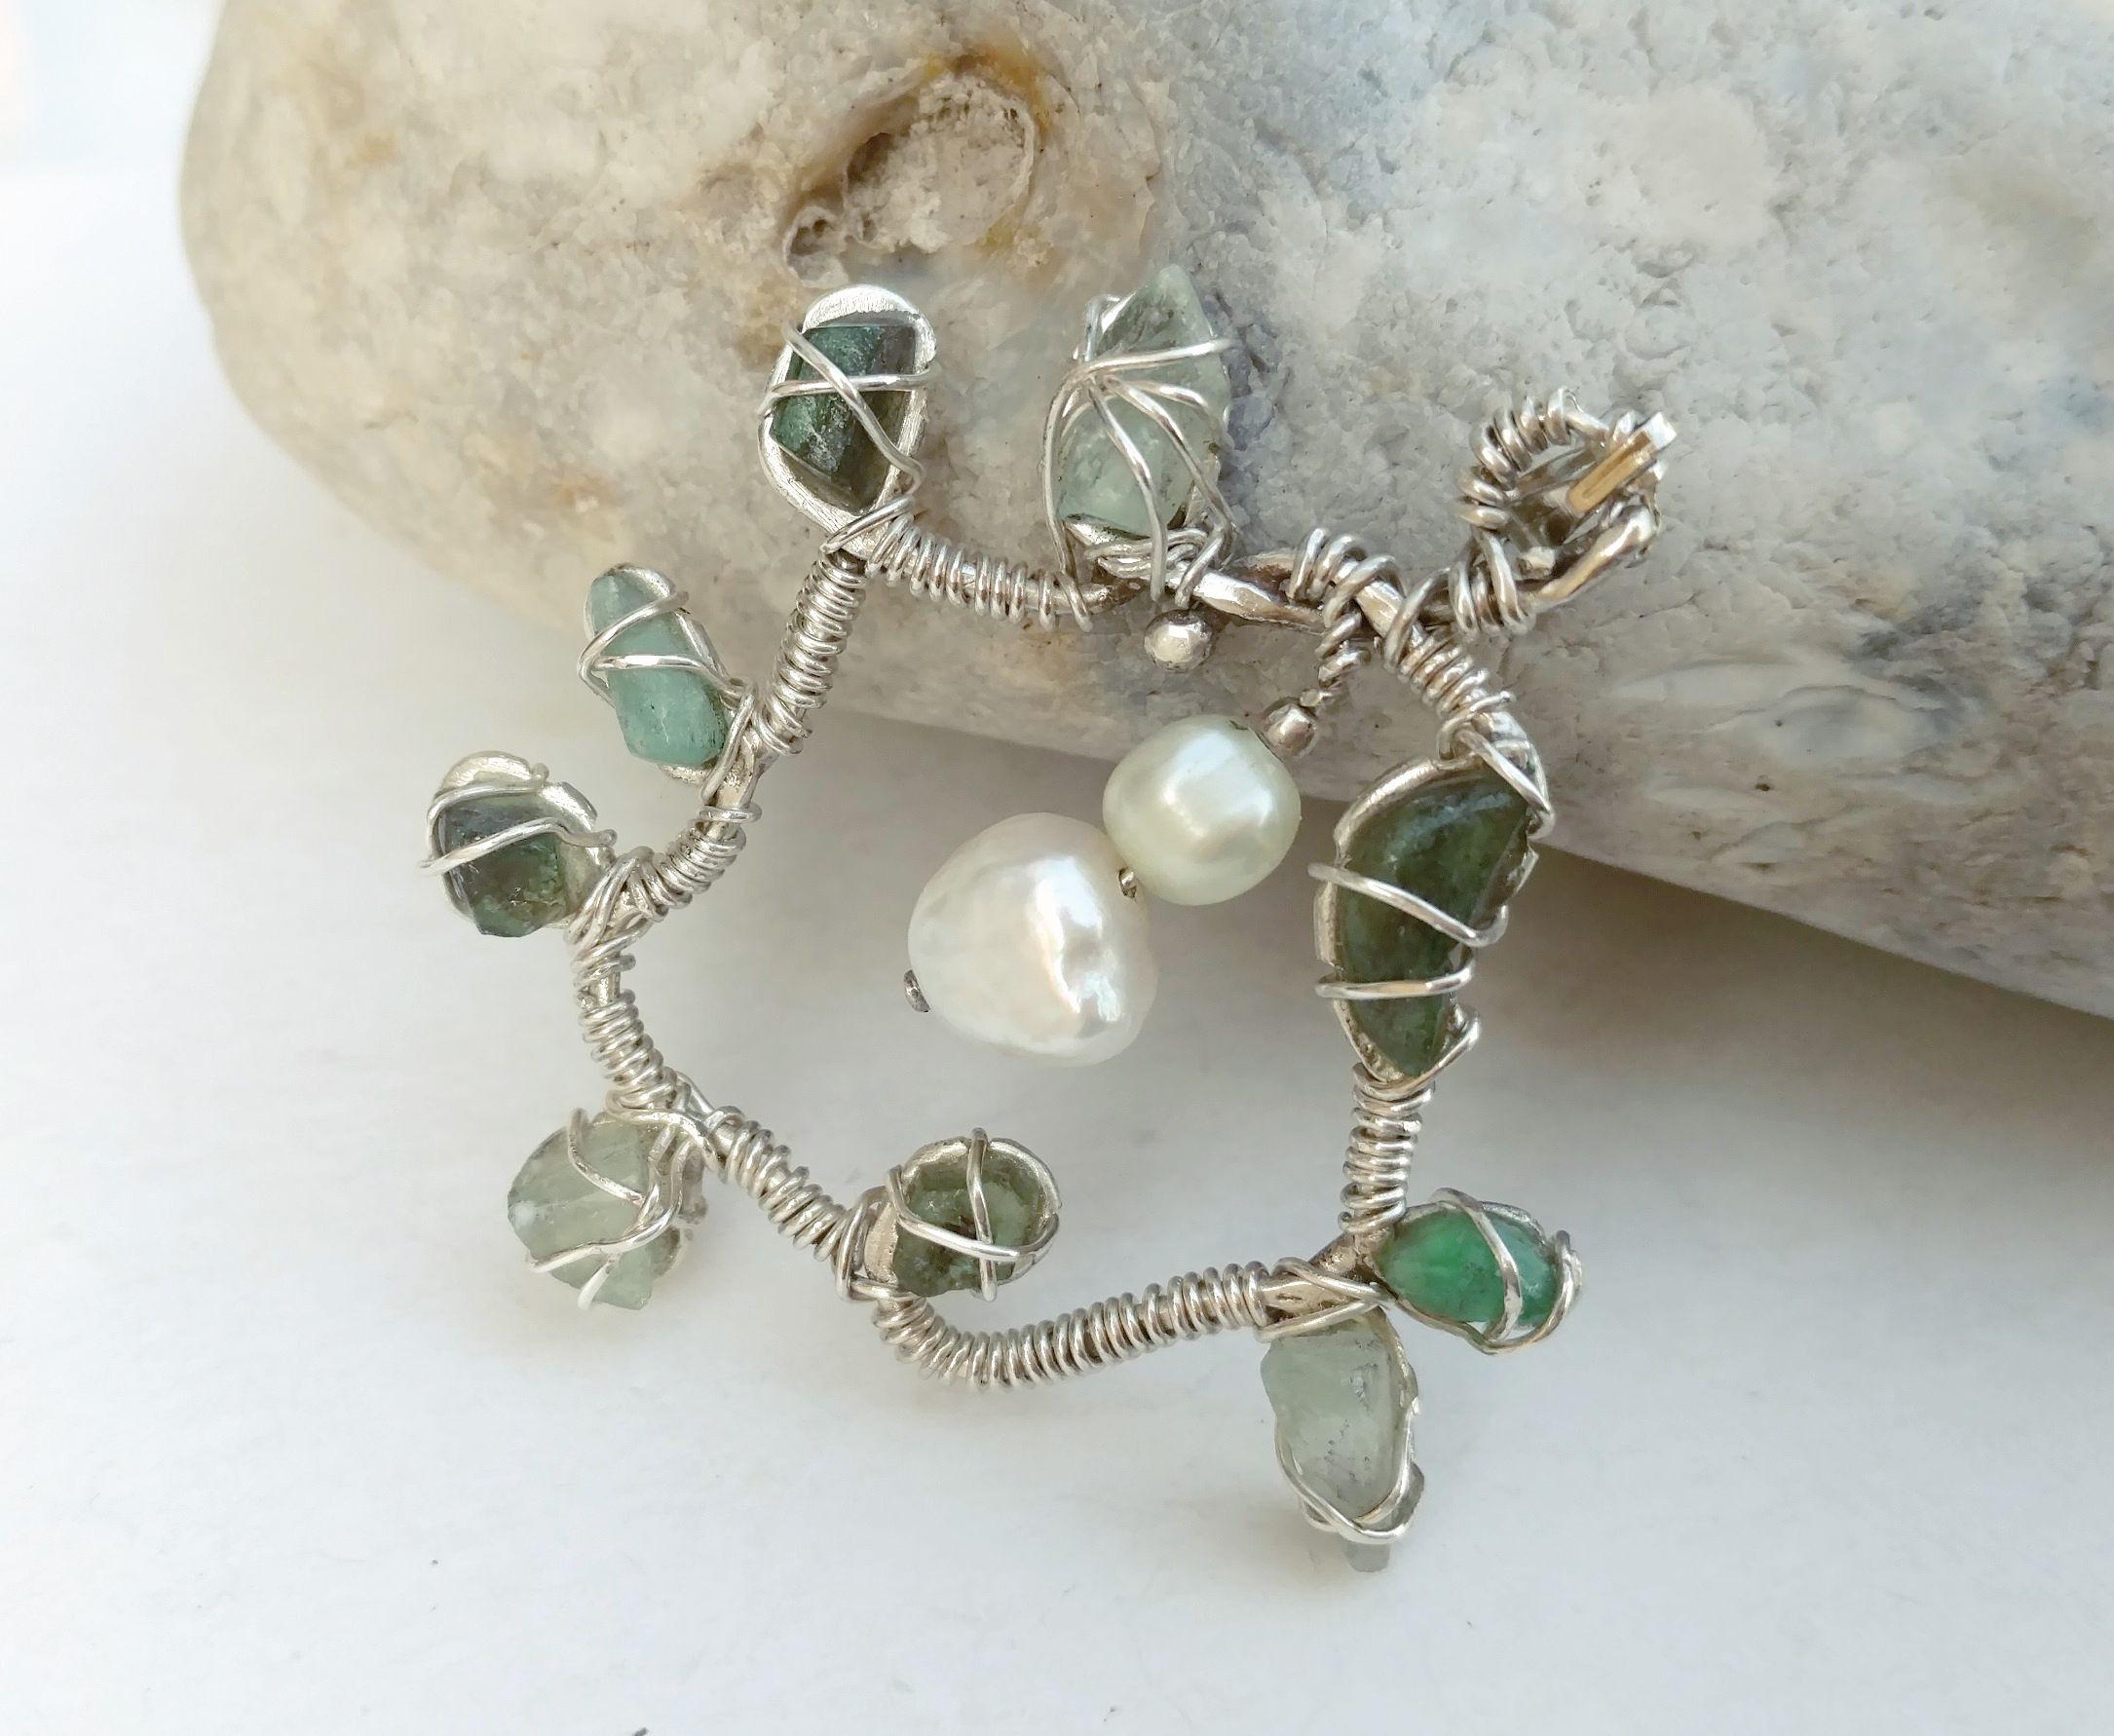 raw beryl pendant, emerald aquamarine crystals, pearl, silver